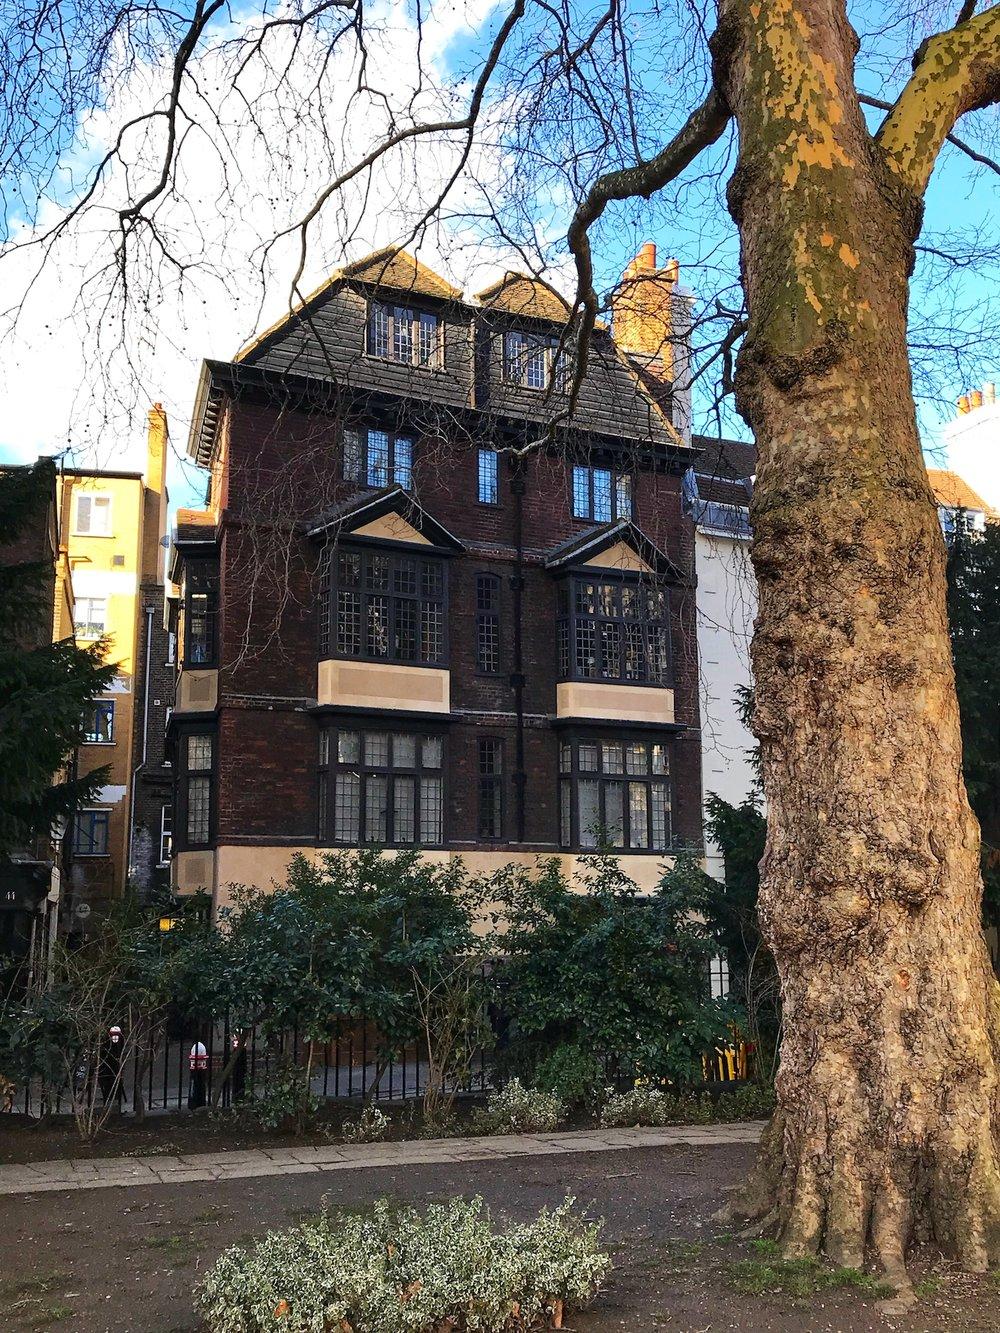 London's Oldest House.